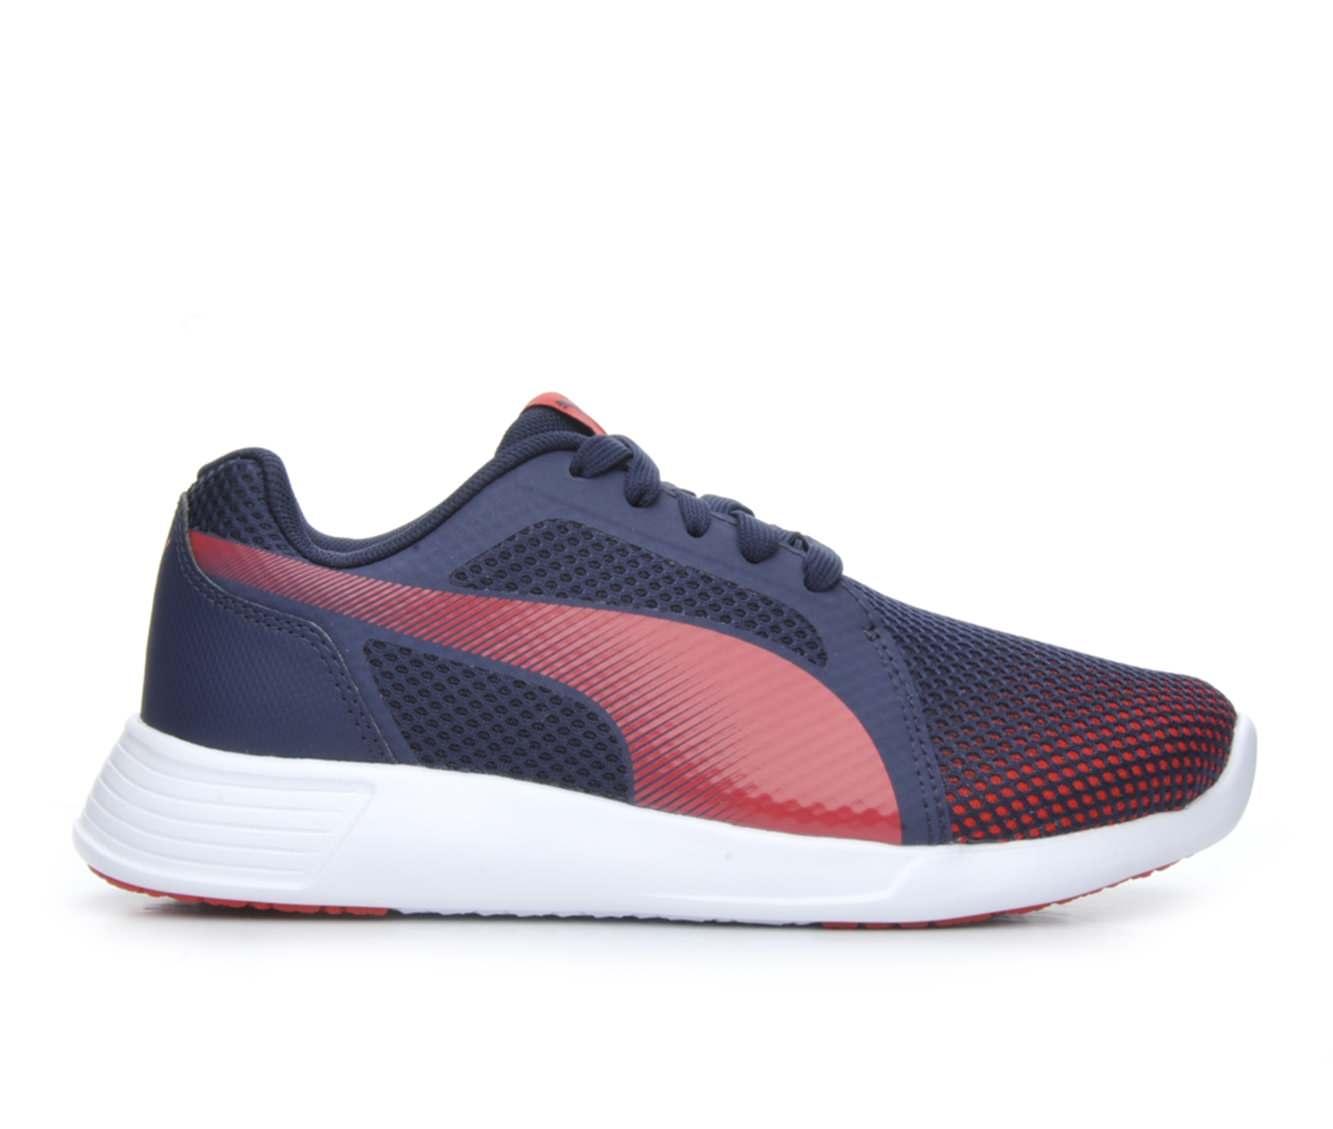 Boys' Puma ST Trainer Evo Techfade Jr Training Shoe (Blue - Size 5.5 - Big Kid) 1617139